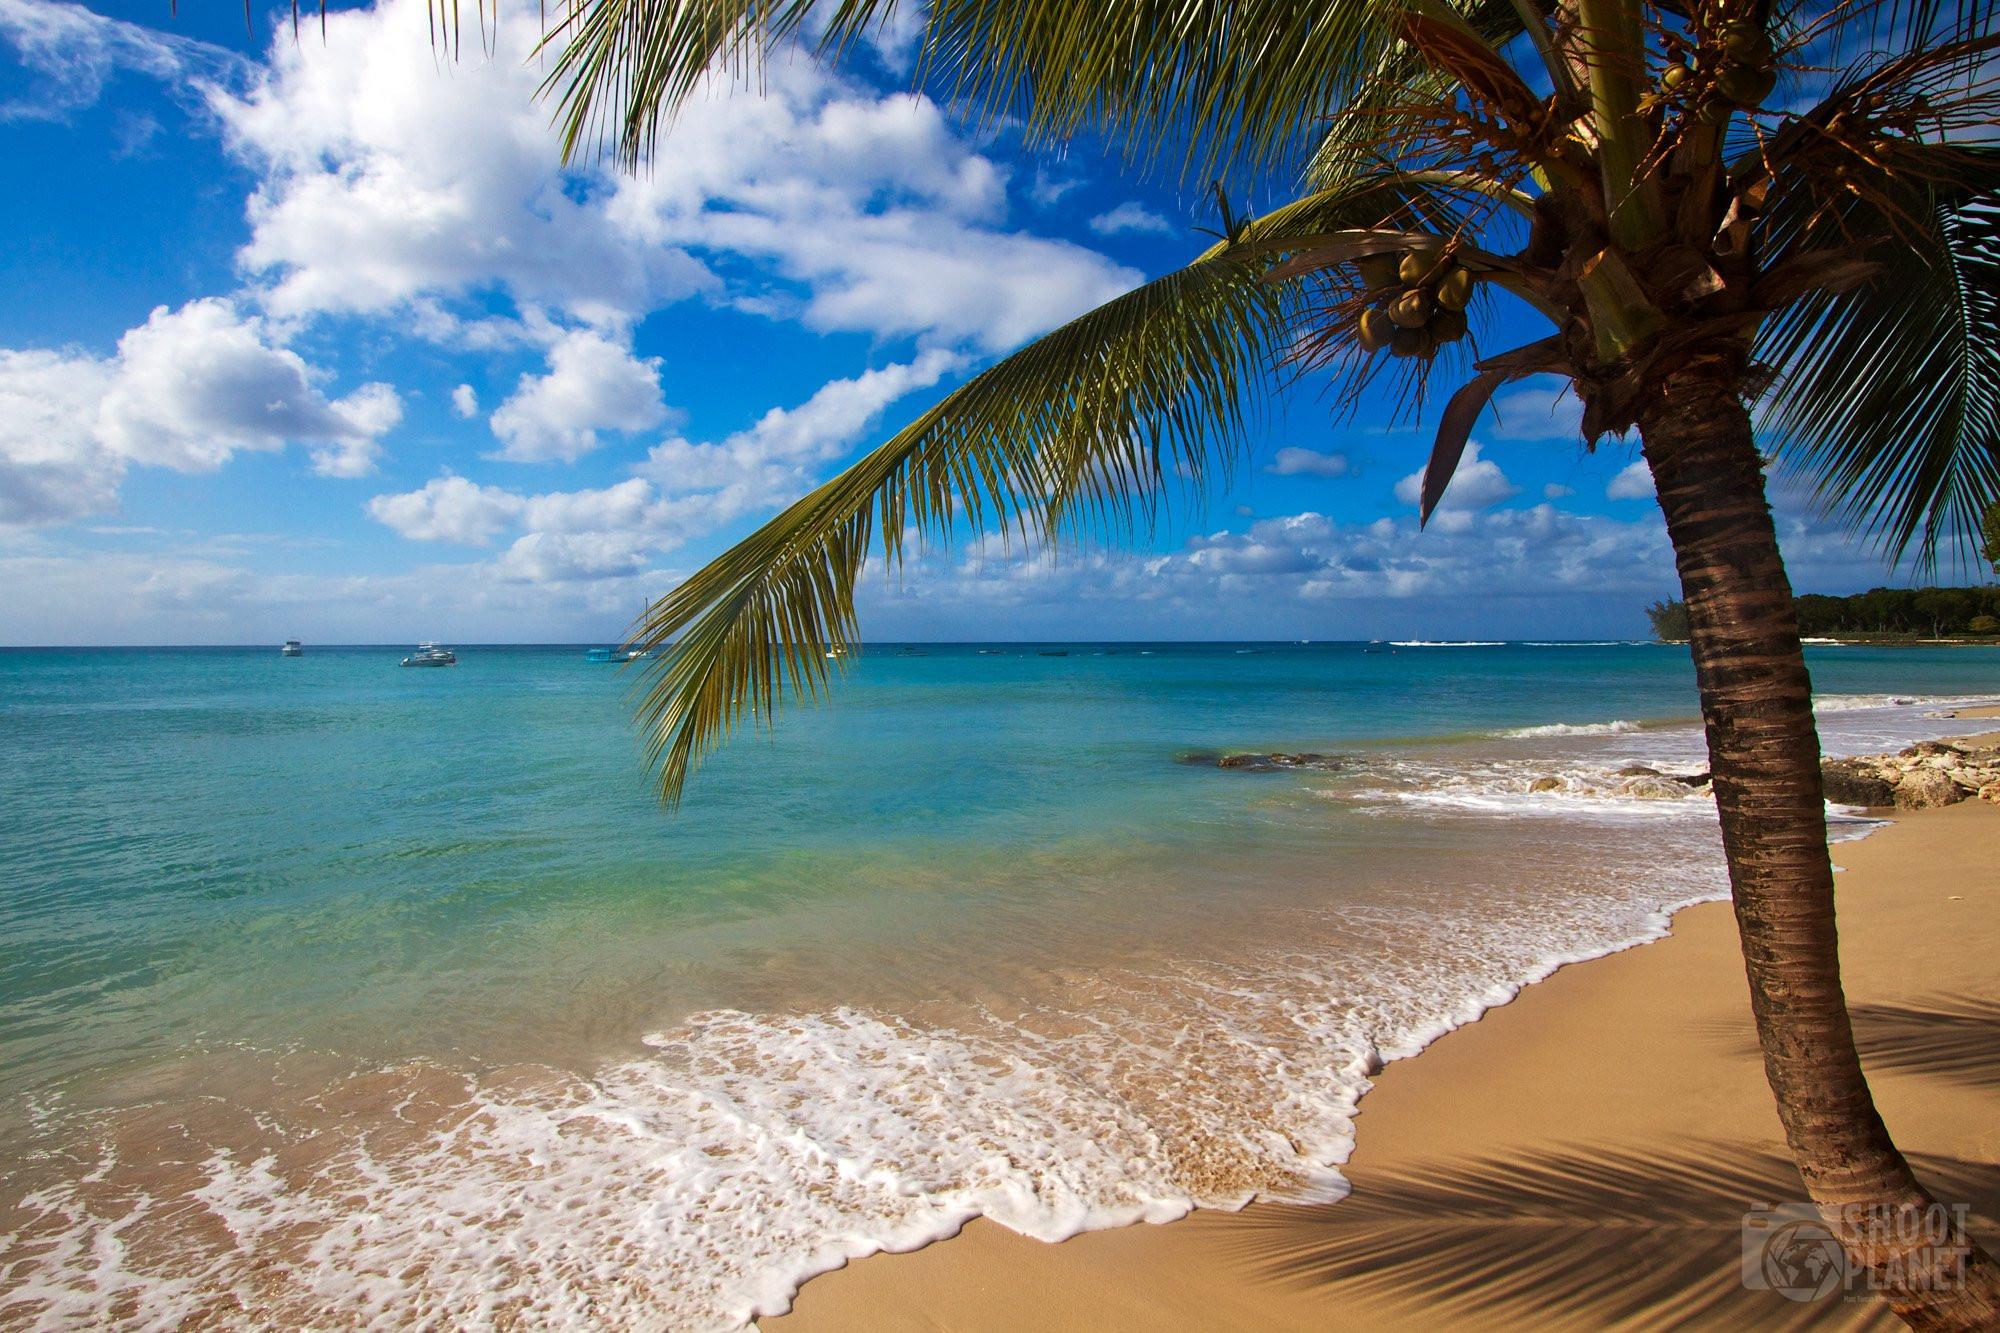 Discovery Bay beach coconut tree, Barbados Island